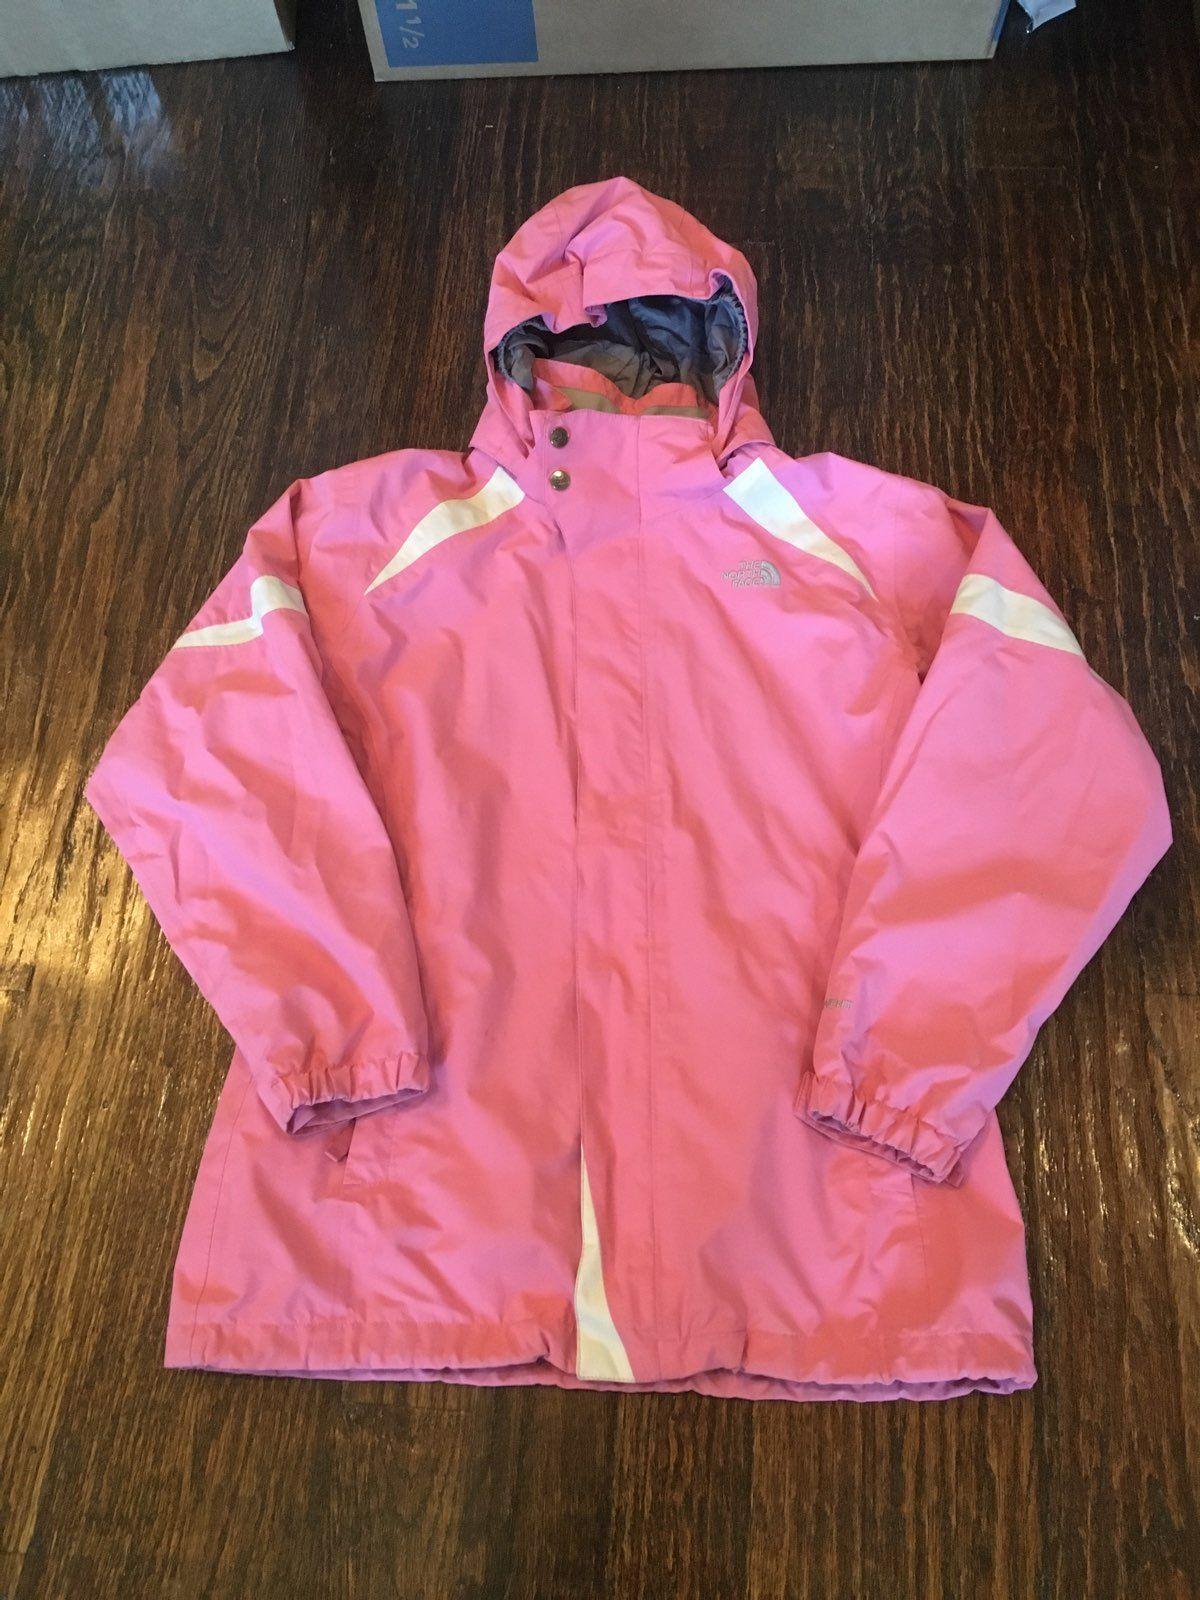 The North Face Pink Girls Jacket - XL - Mercari: BUY & SELL THINGS ...